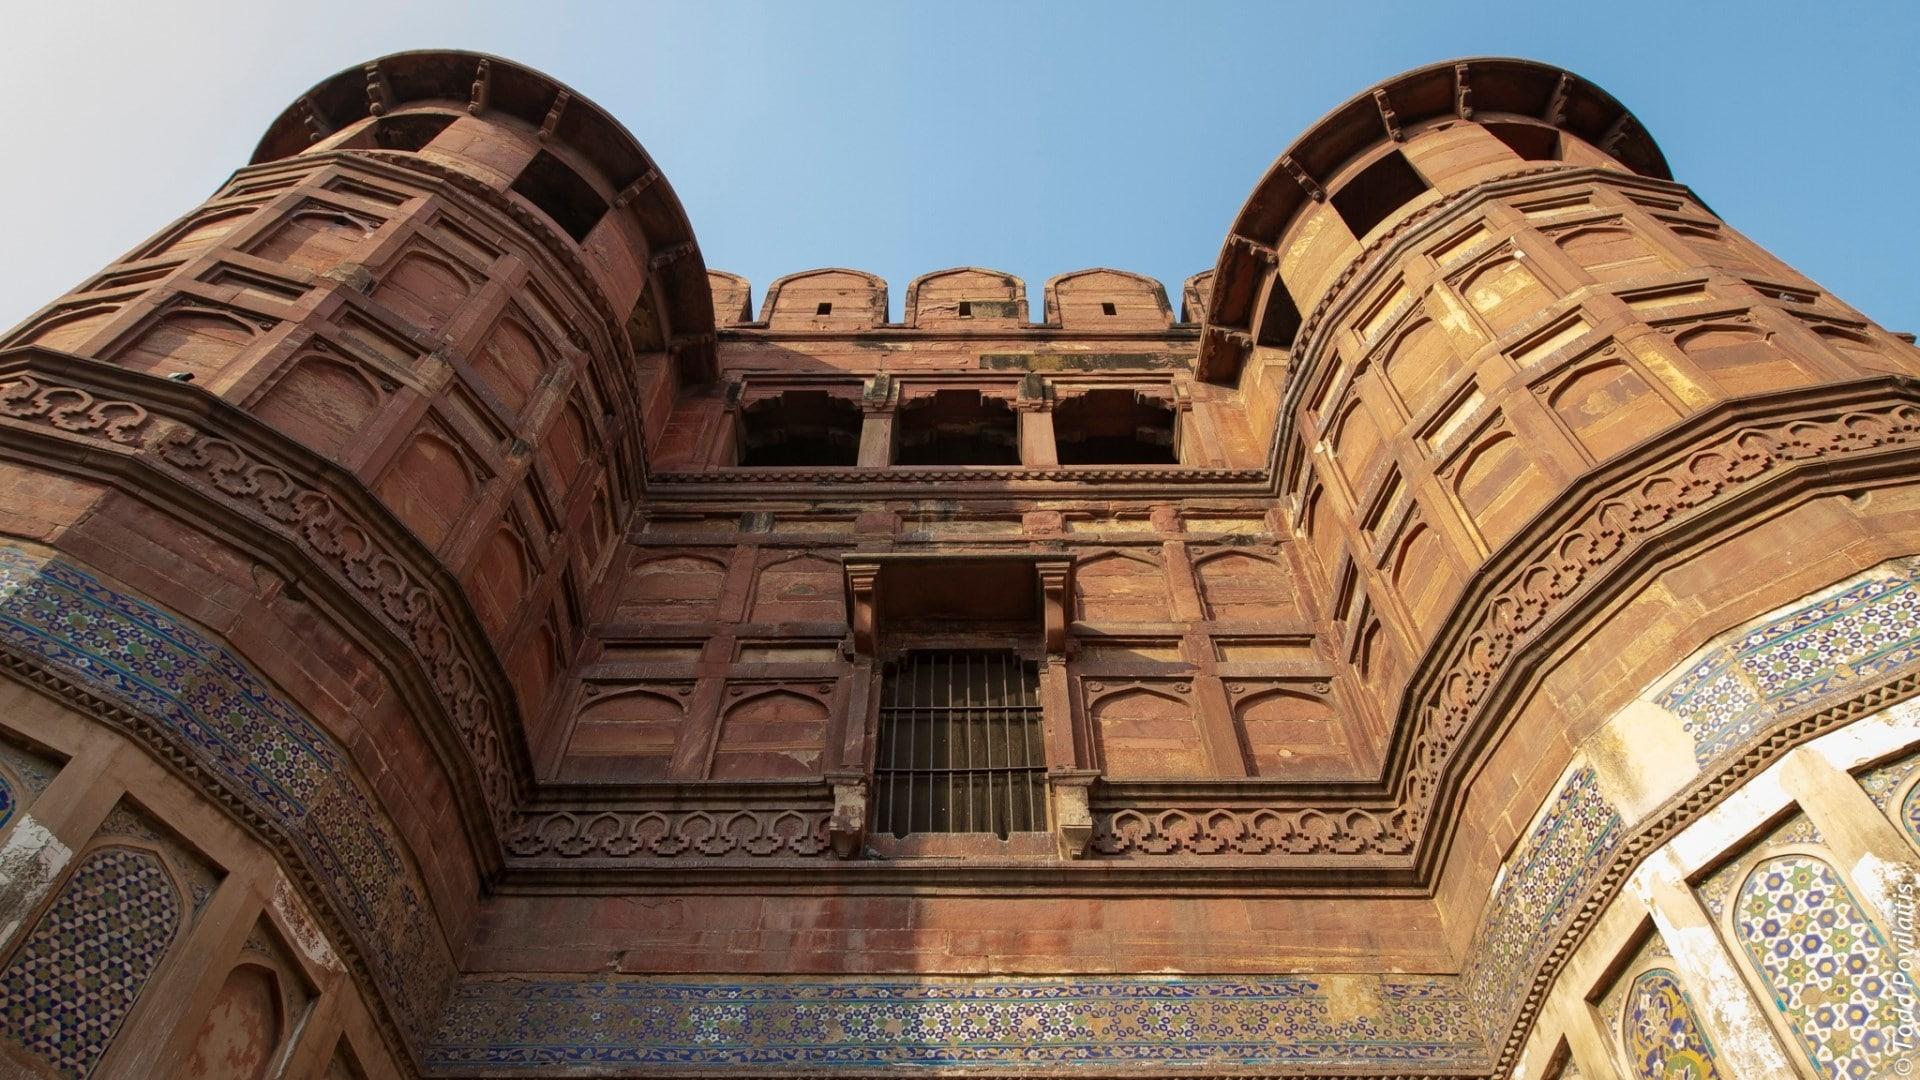 Inside Part of Agra Fort